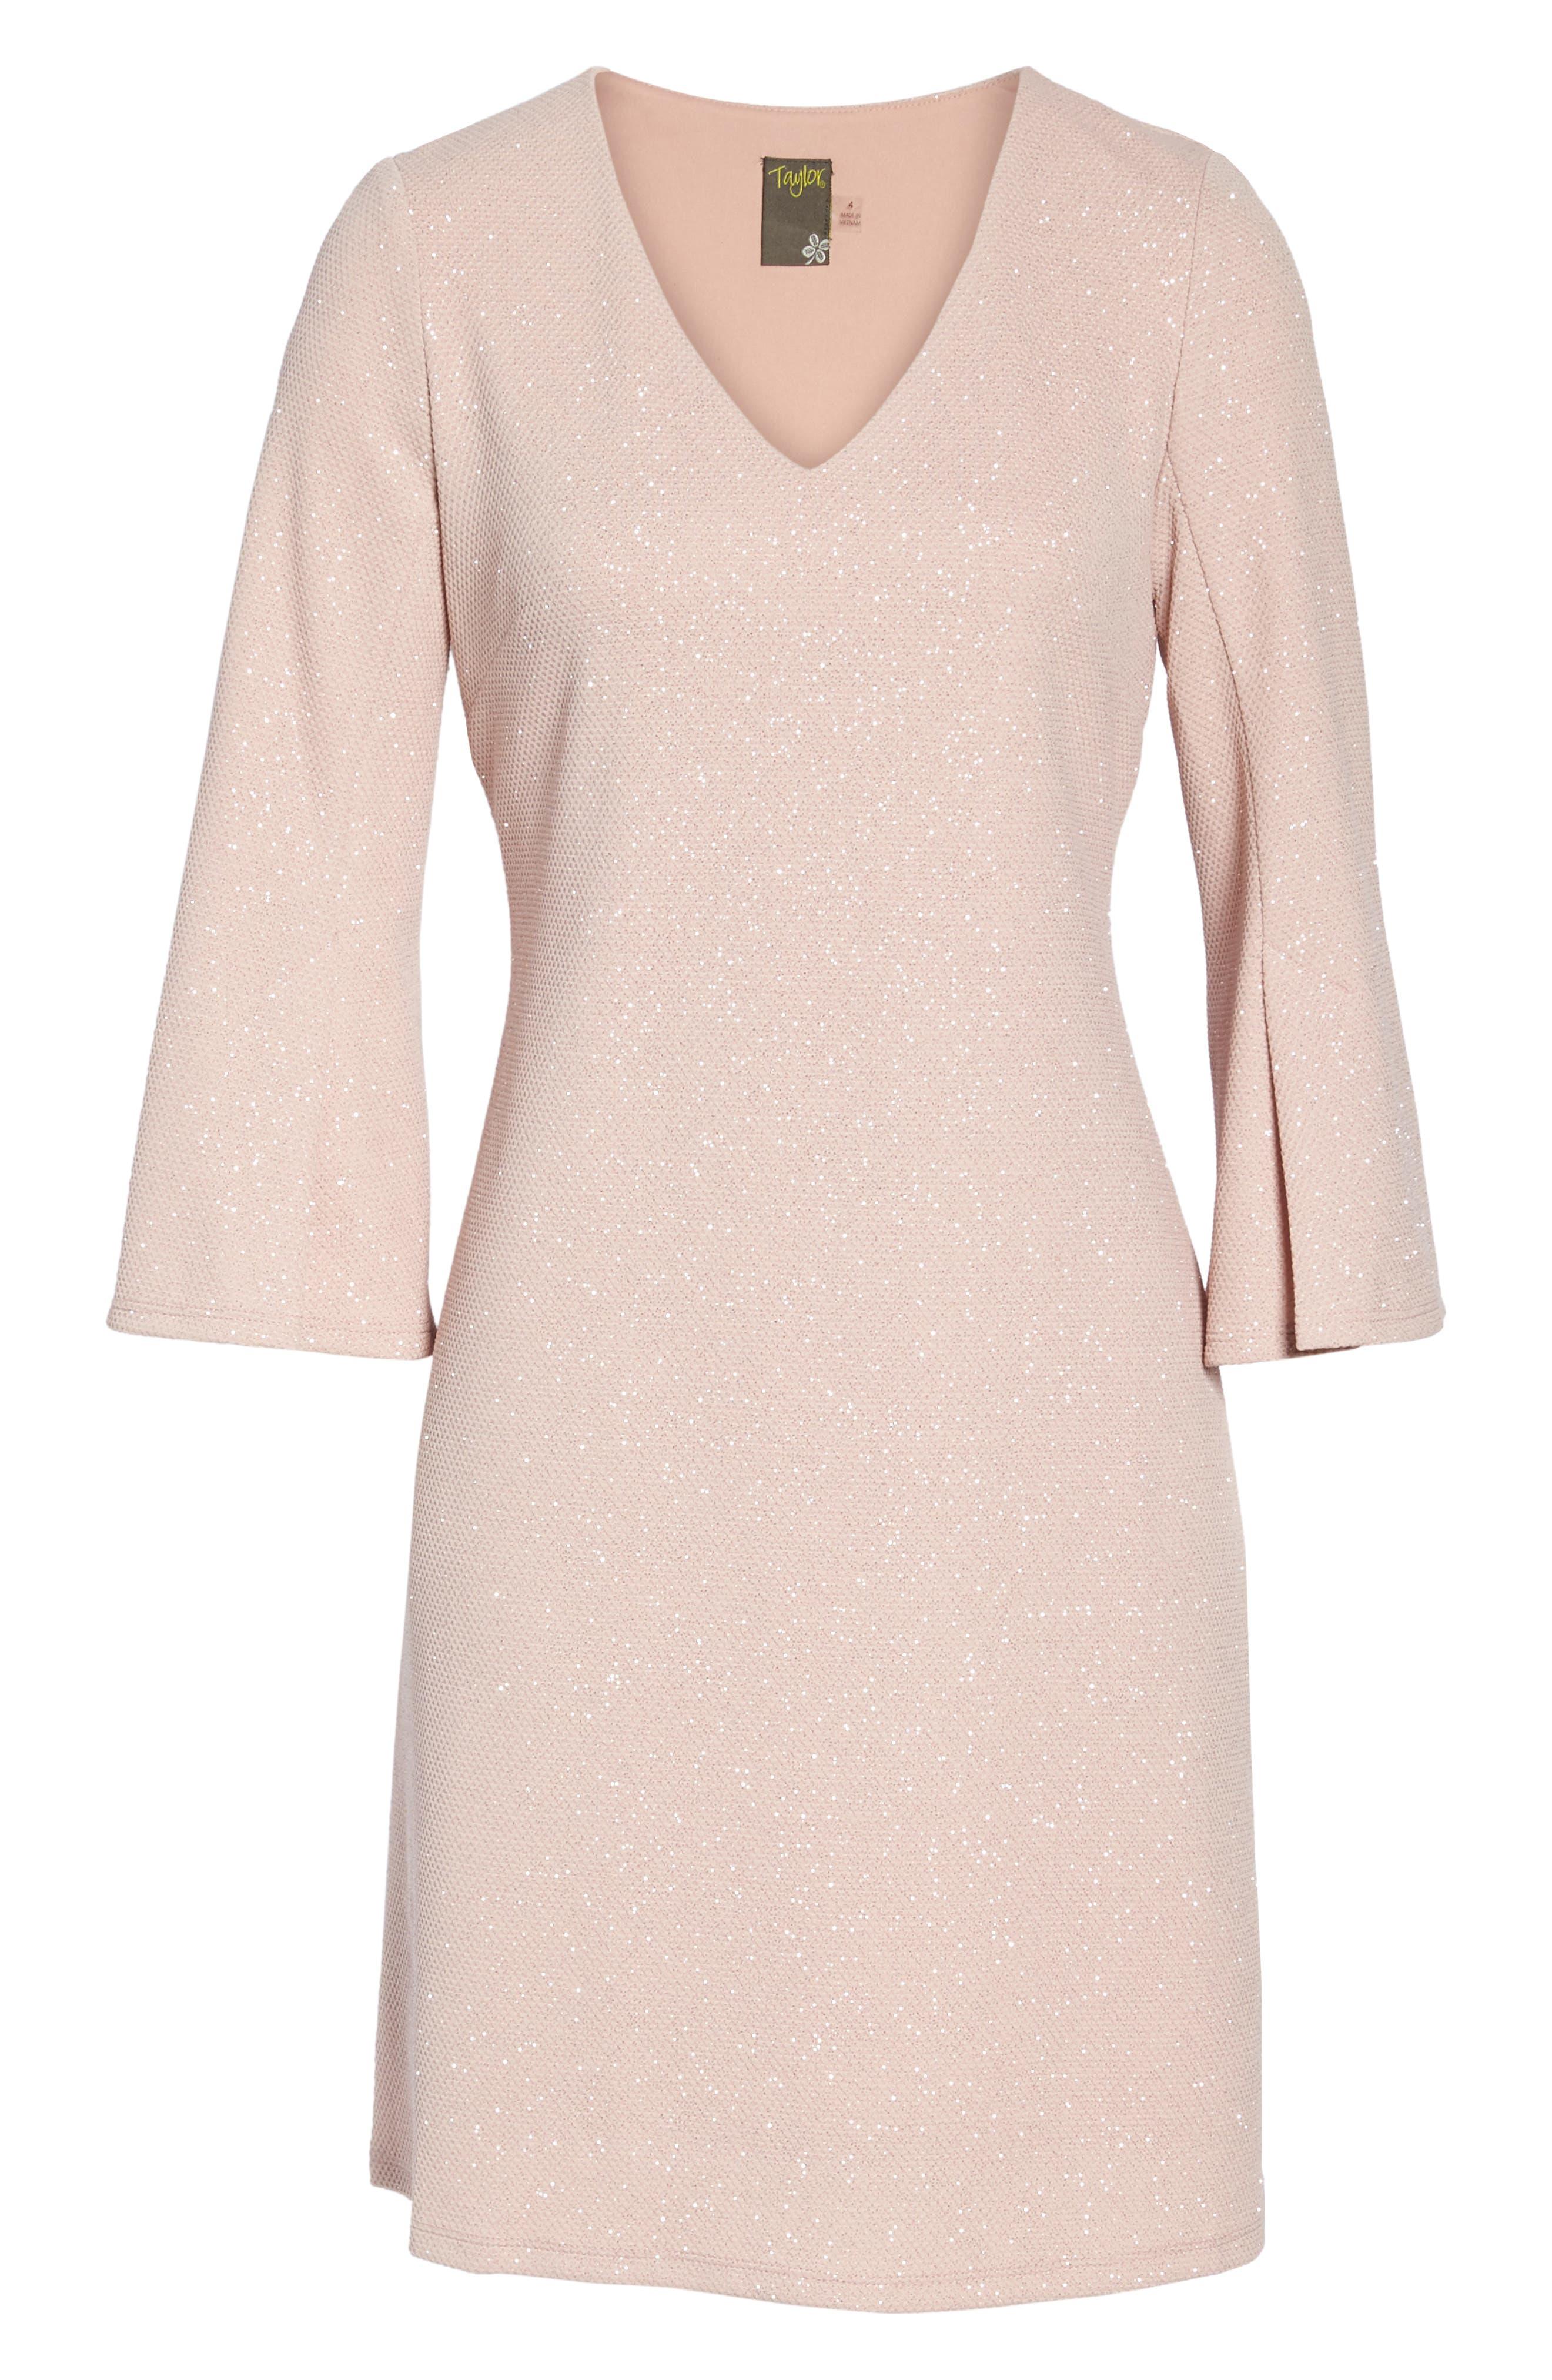 Bell Sleeve Shift Dress,                             Alternate thumbnail 5, color,                             Blush